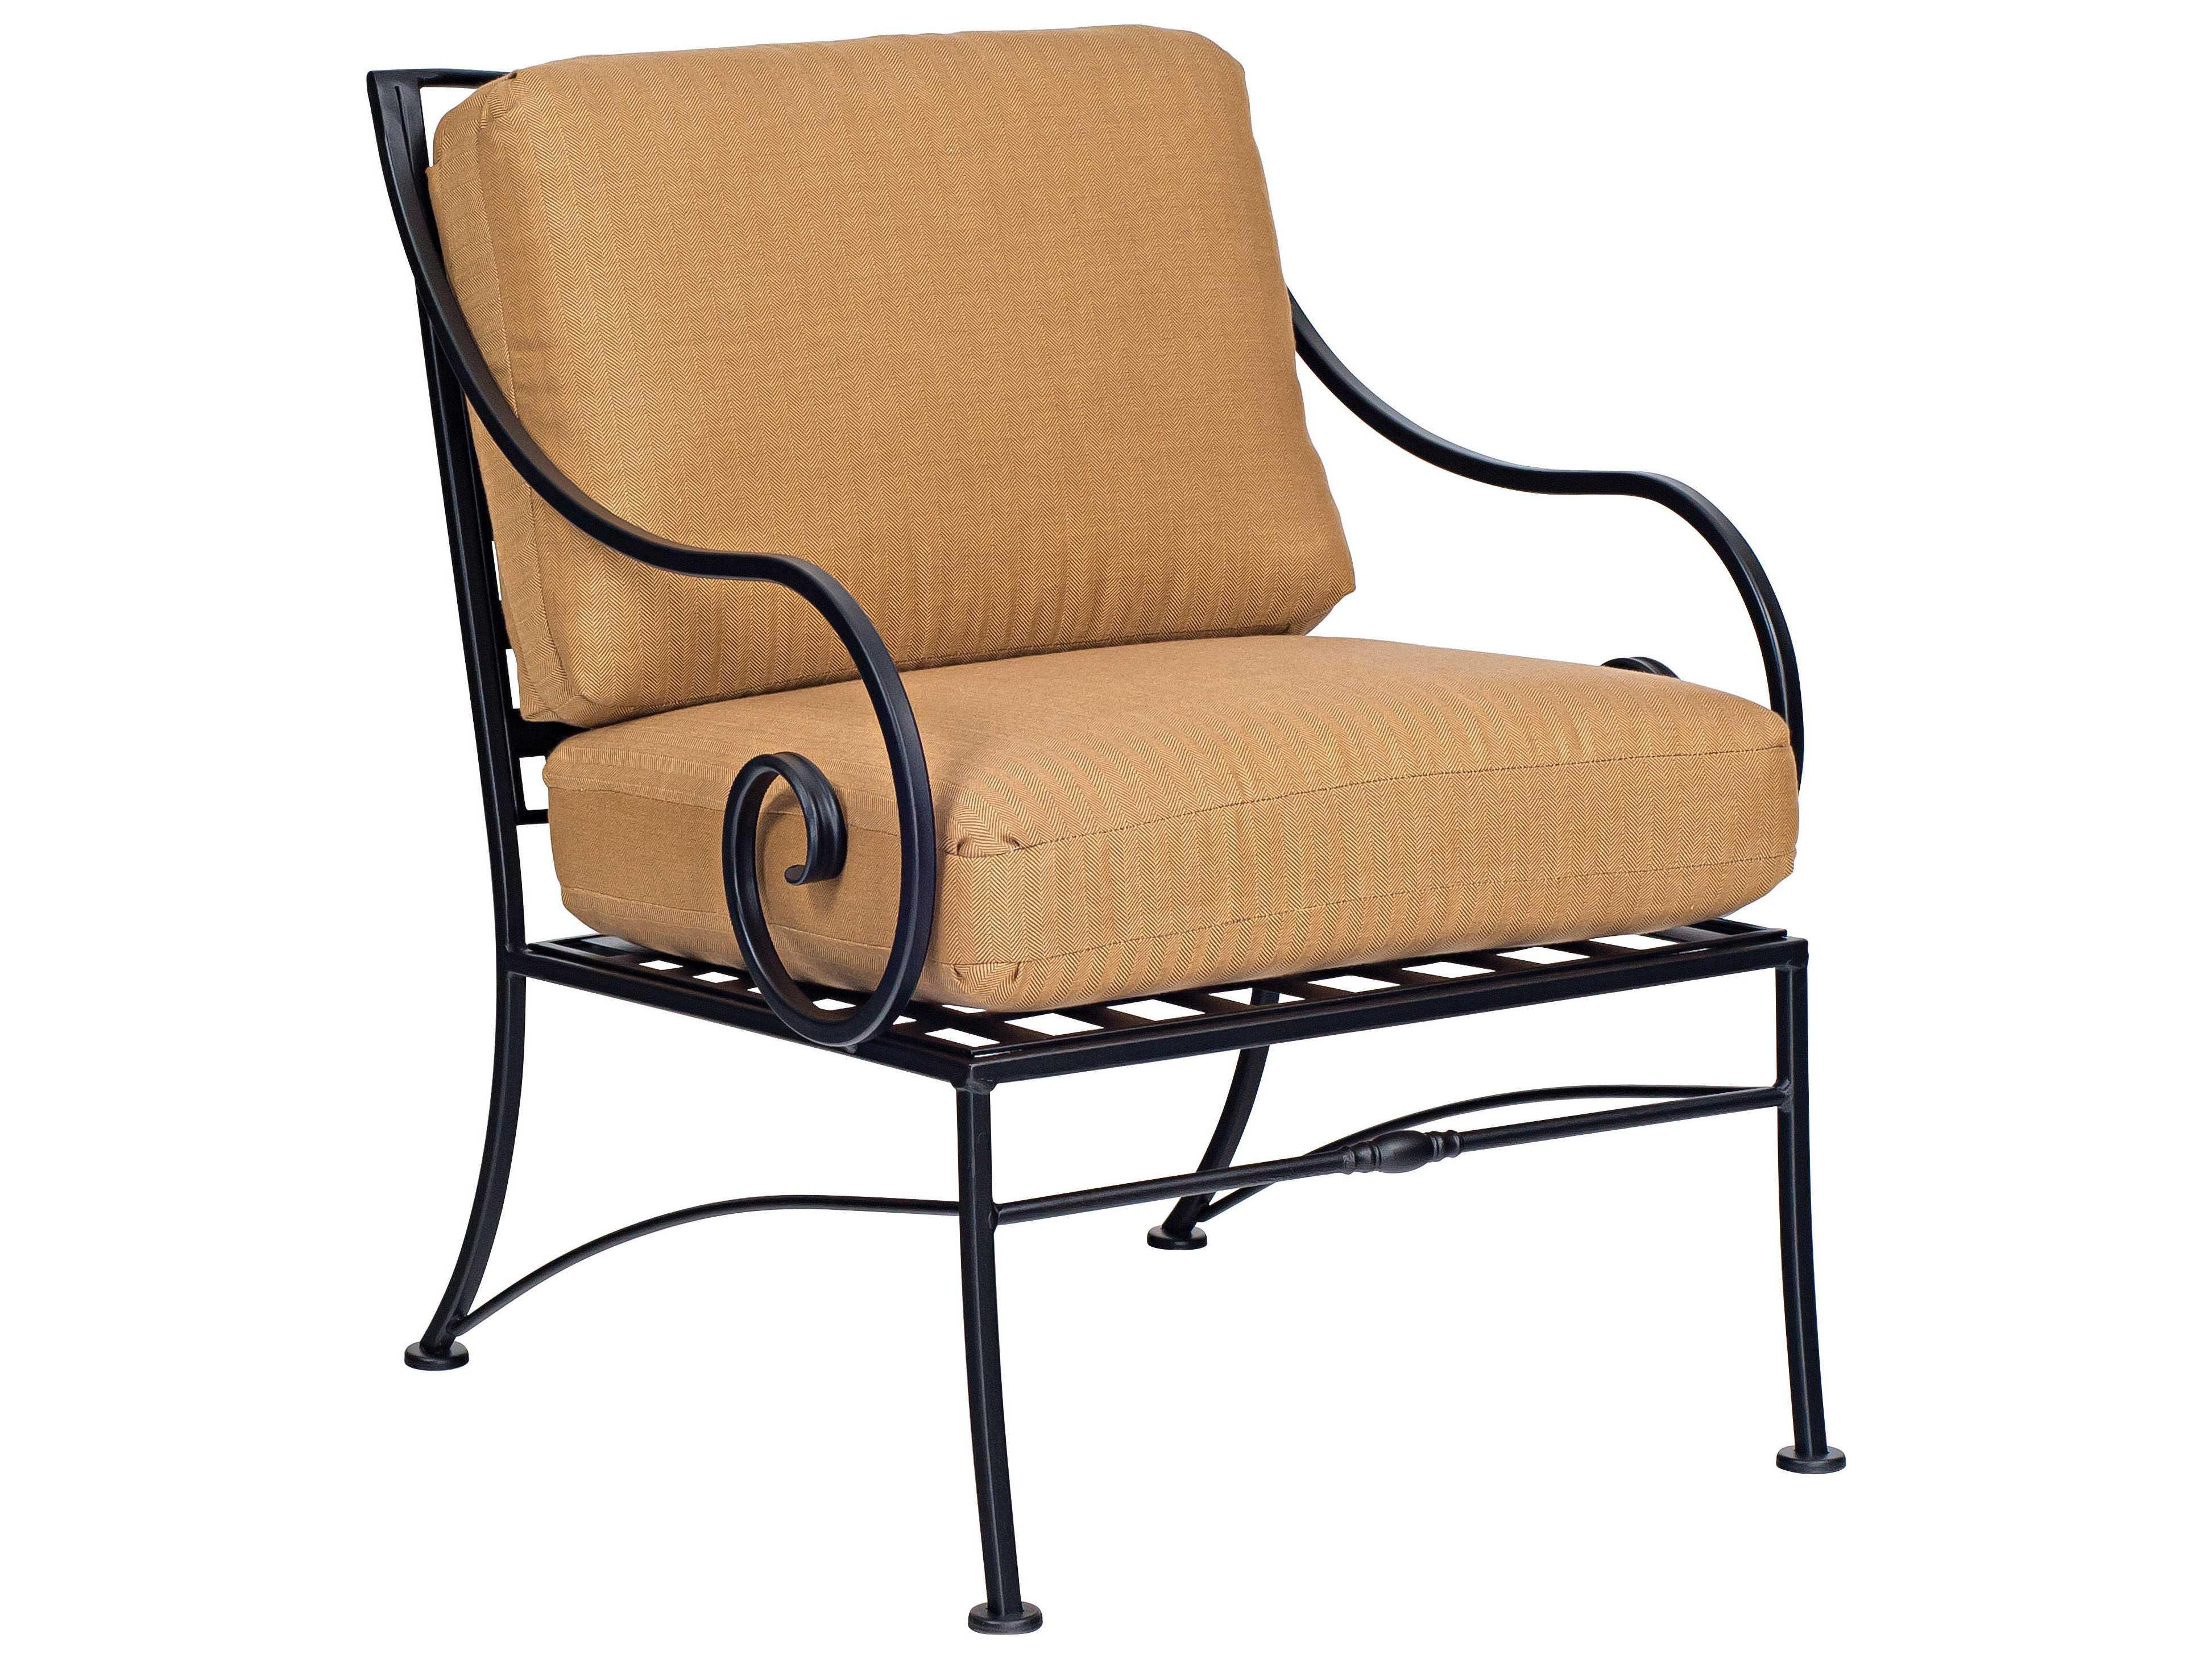 Woodard Sheffield Wrought Iron Lounge Set | GPKLS